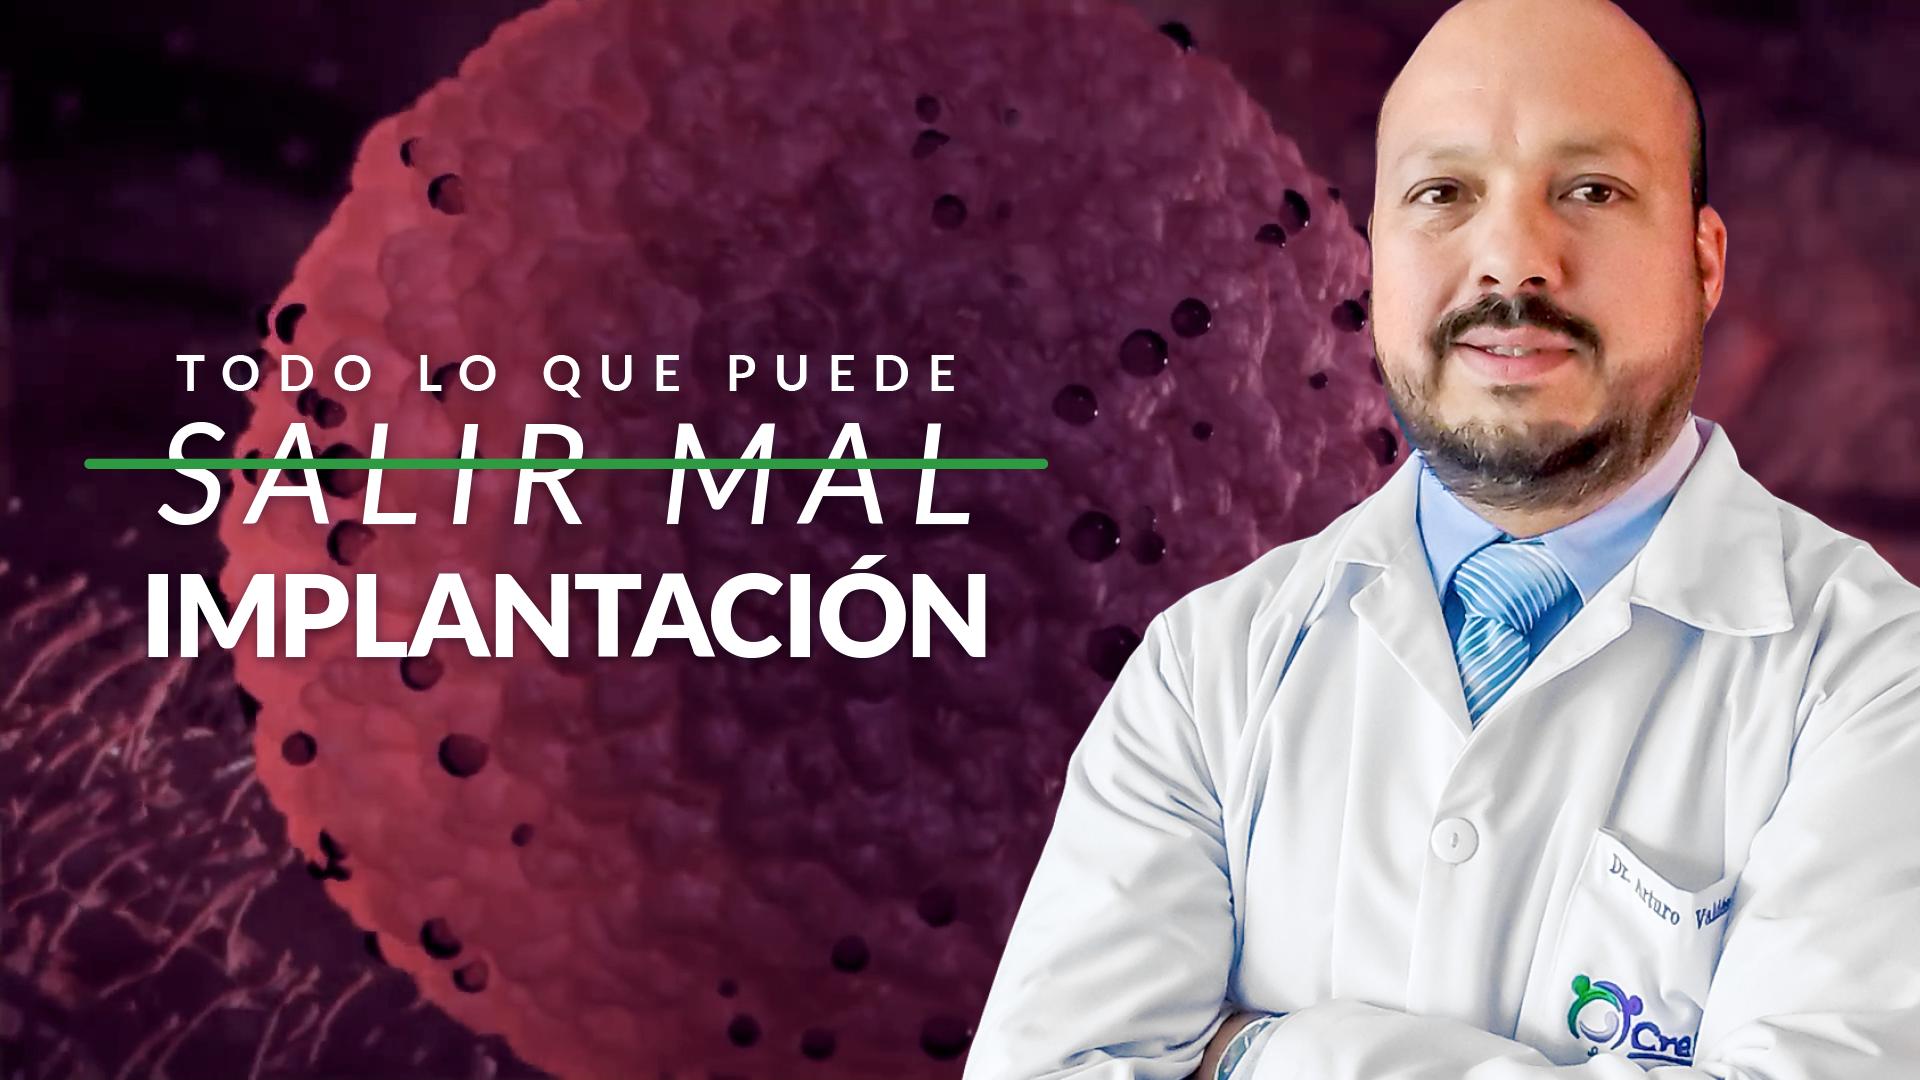 Fertilización In Vitro Implantación